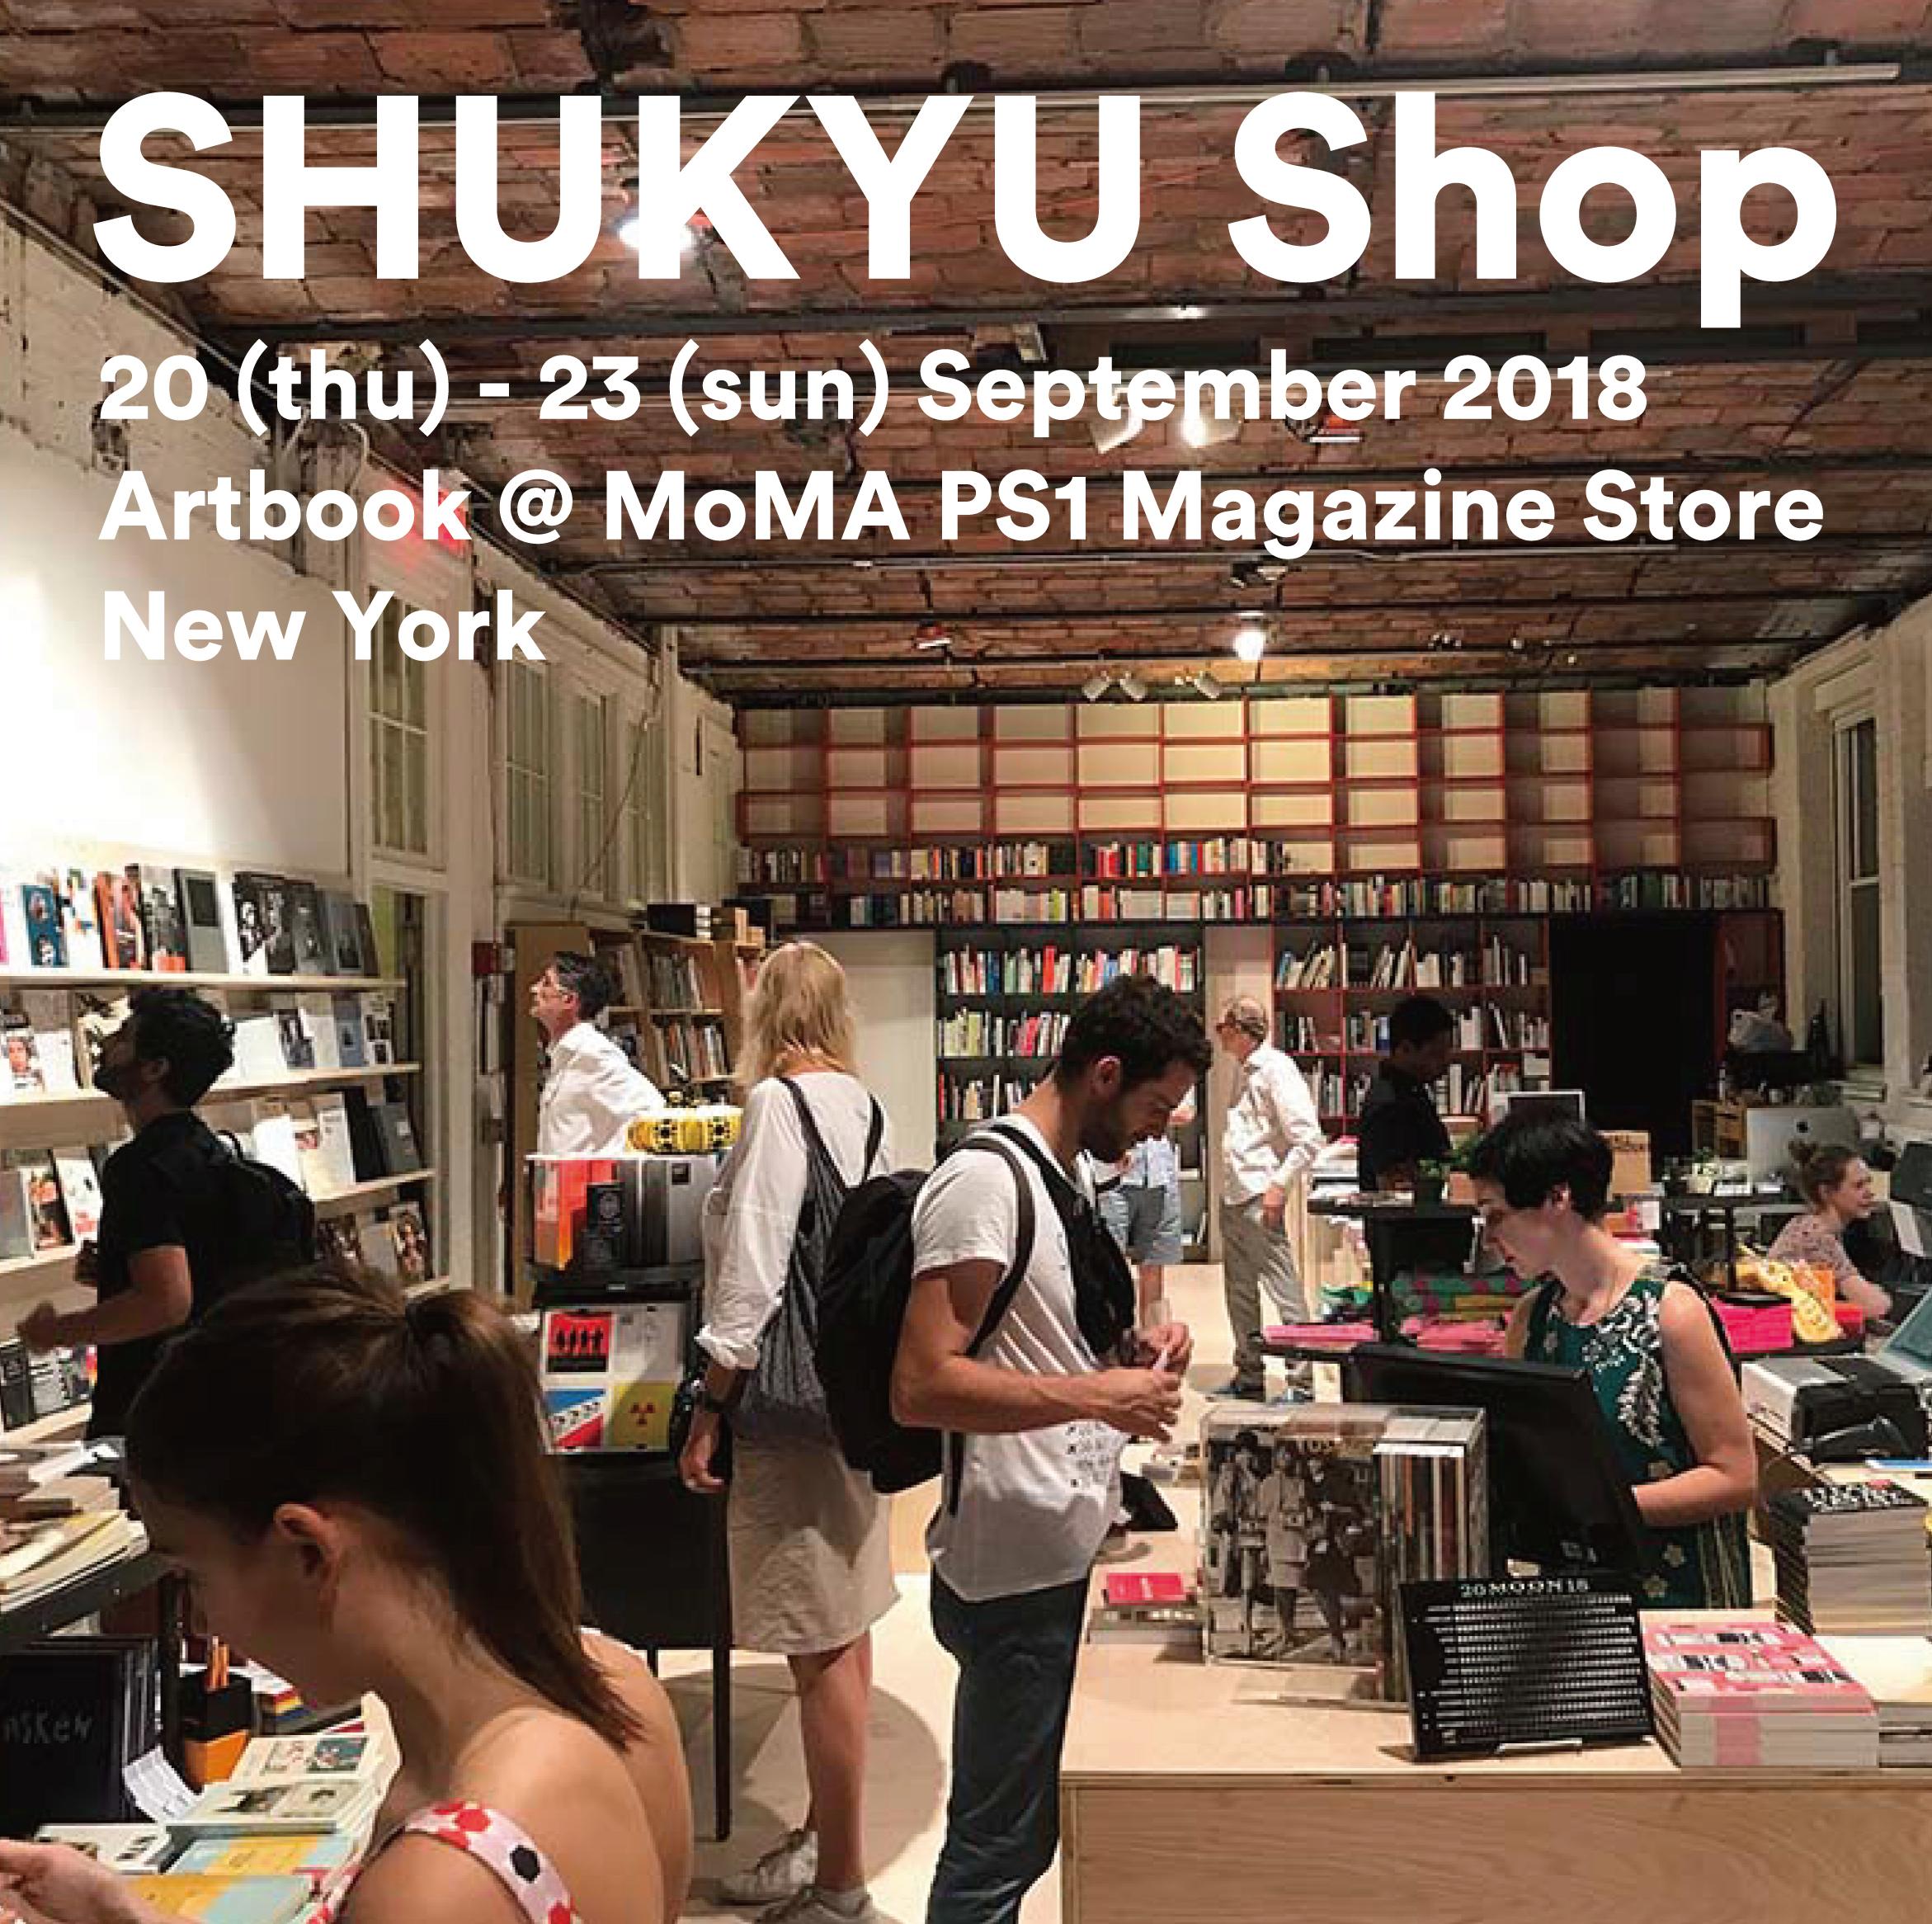 SHUKYU Shop in New York